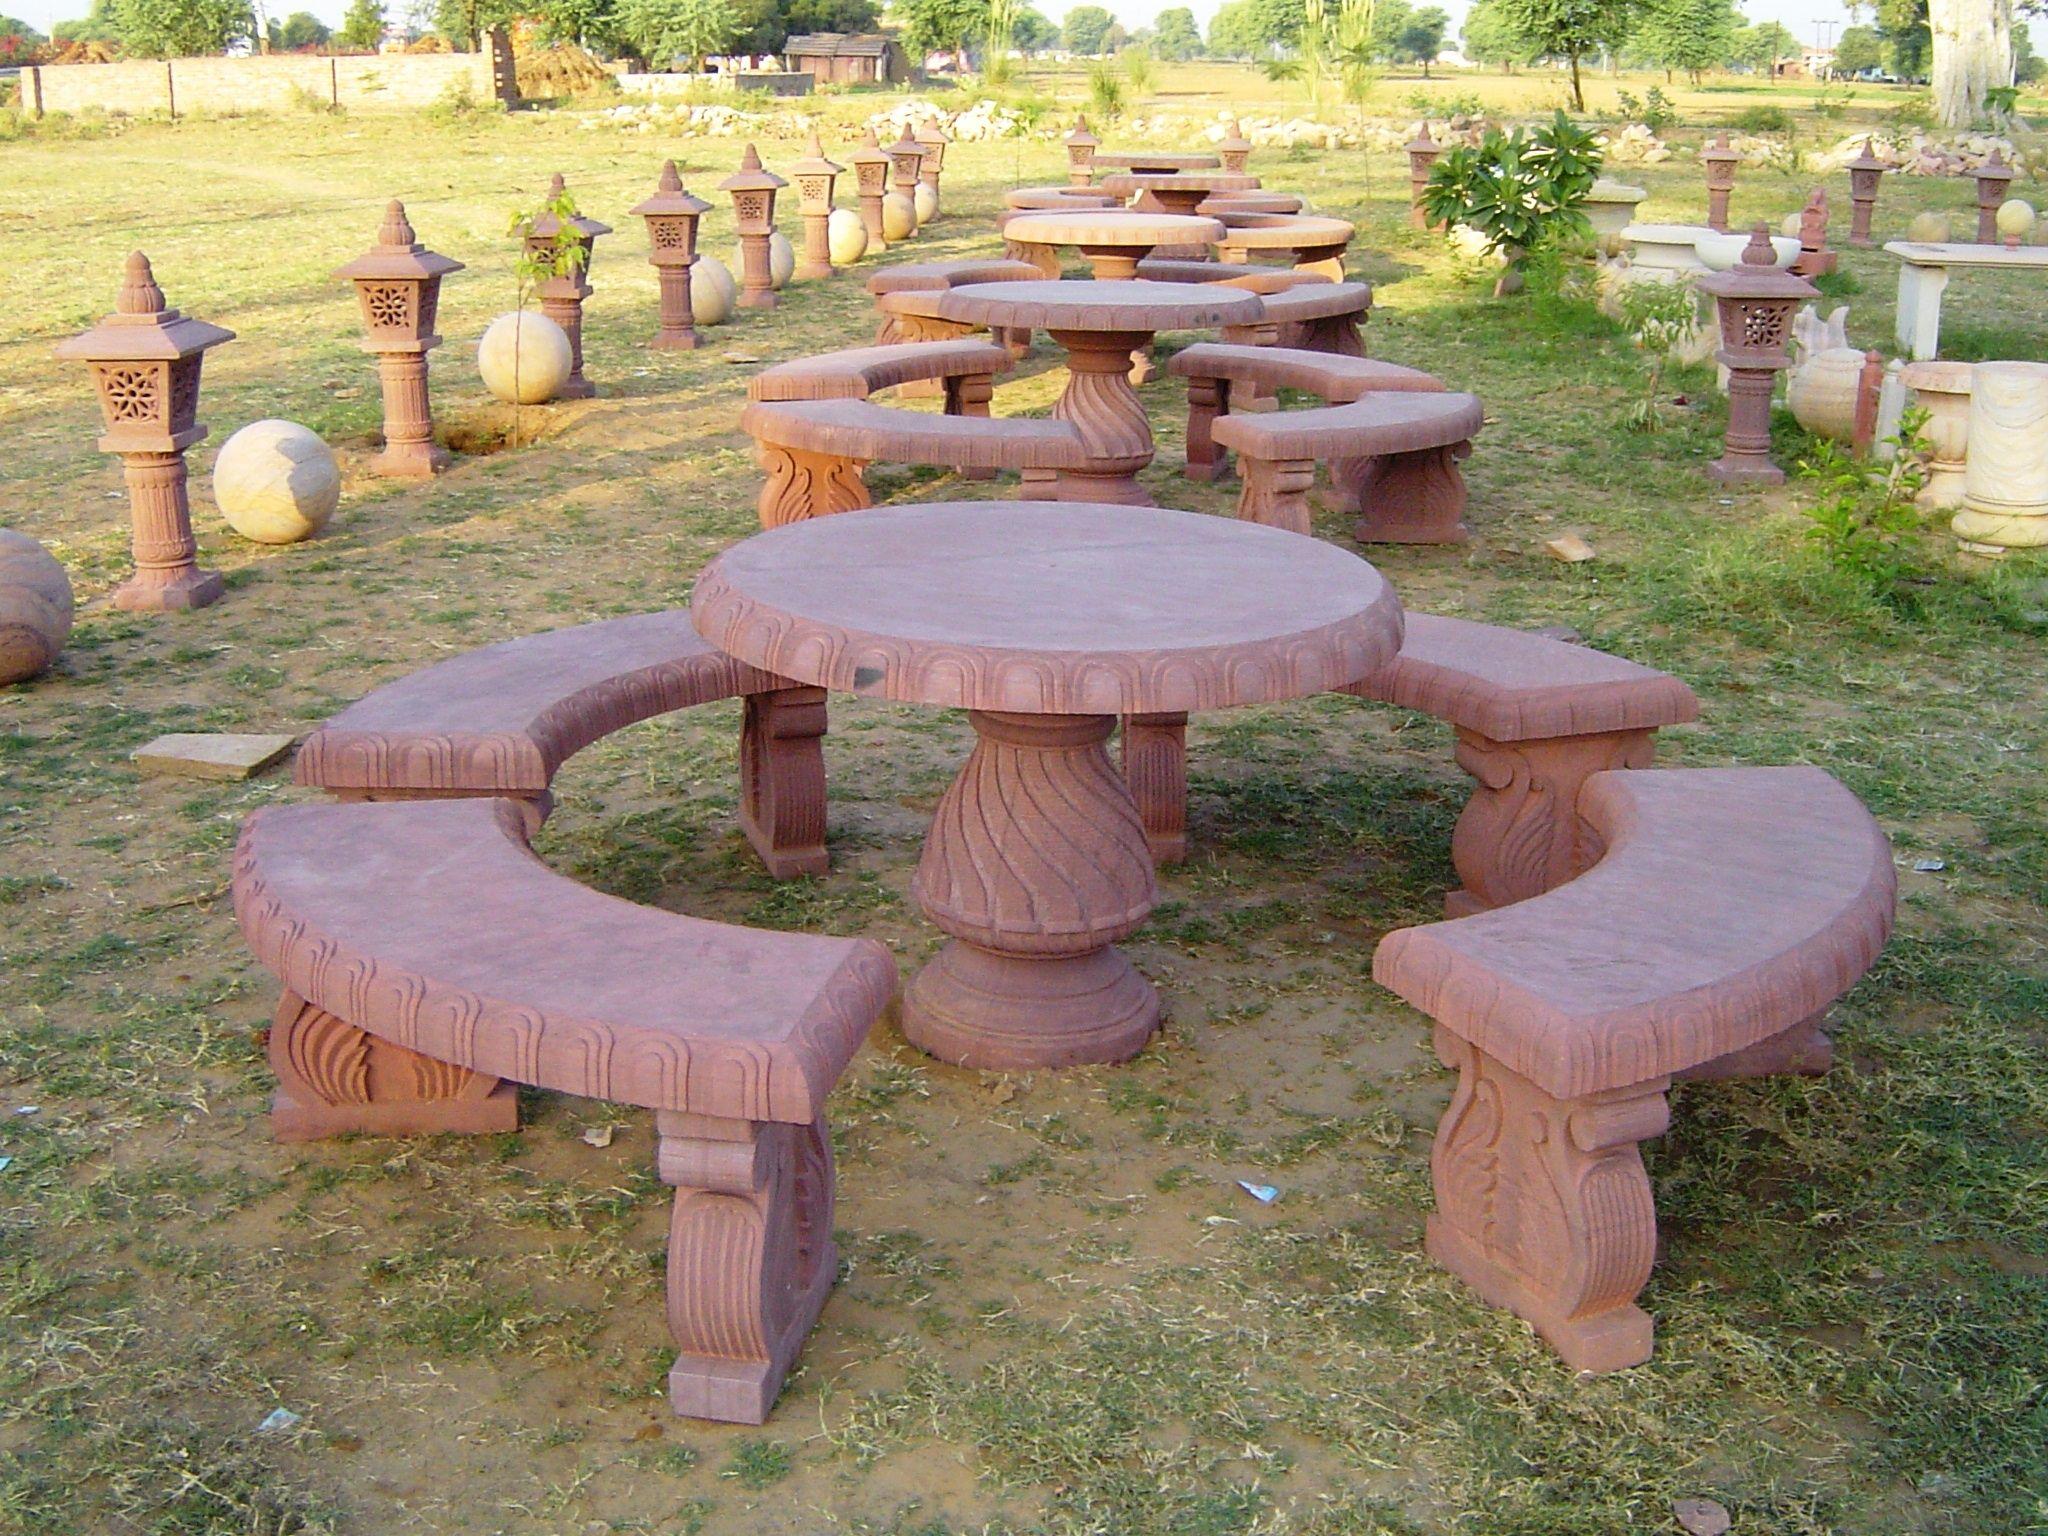 Stone Garden Furniture, पत्थर से बना बगीचे का